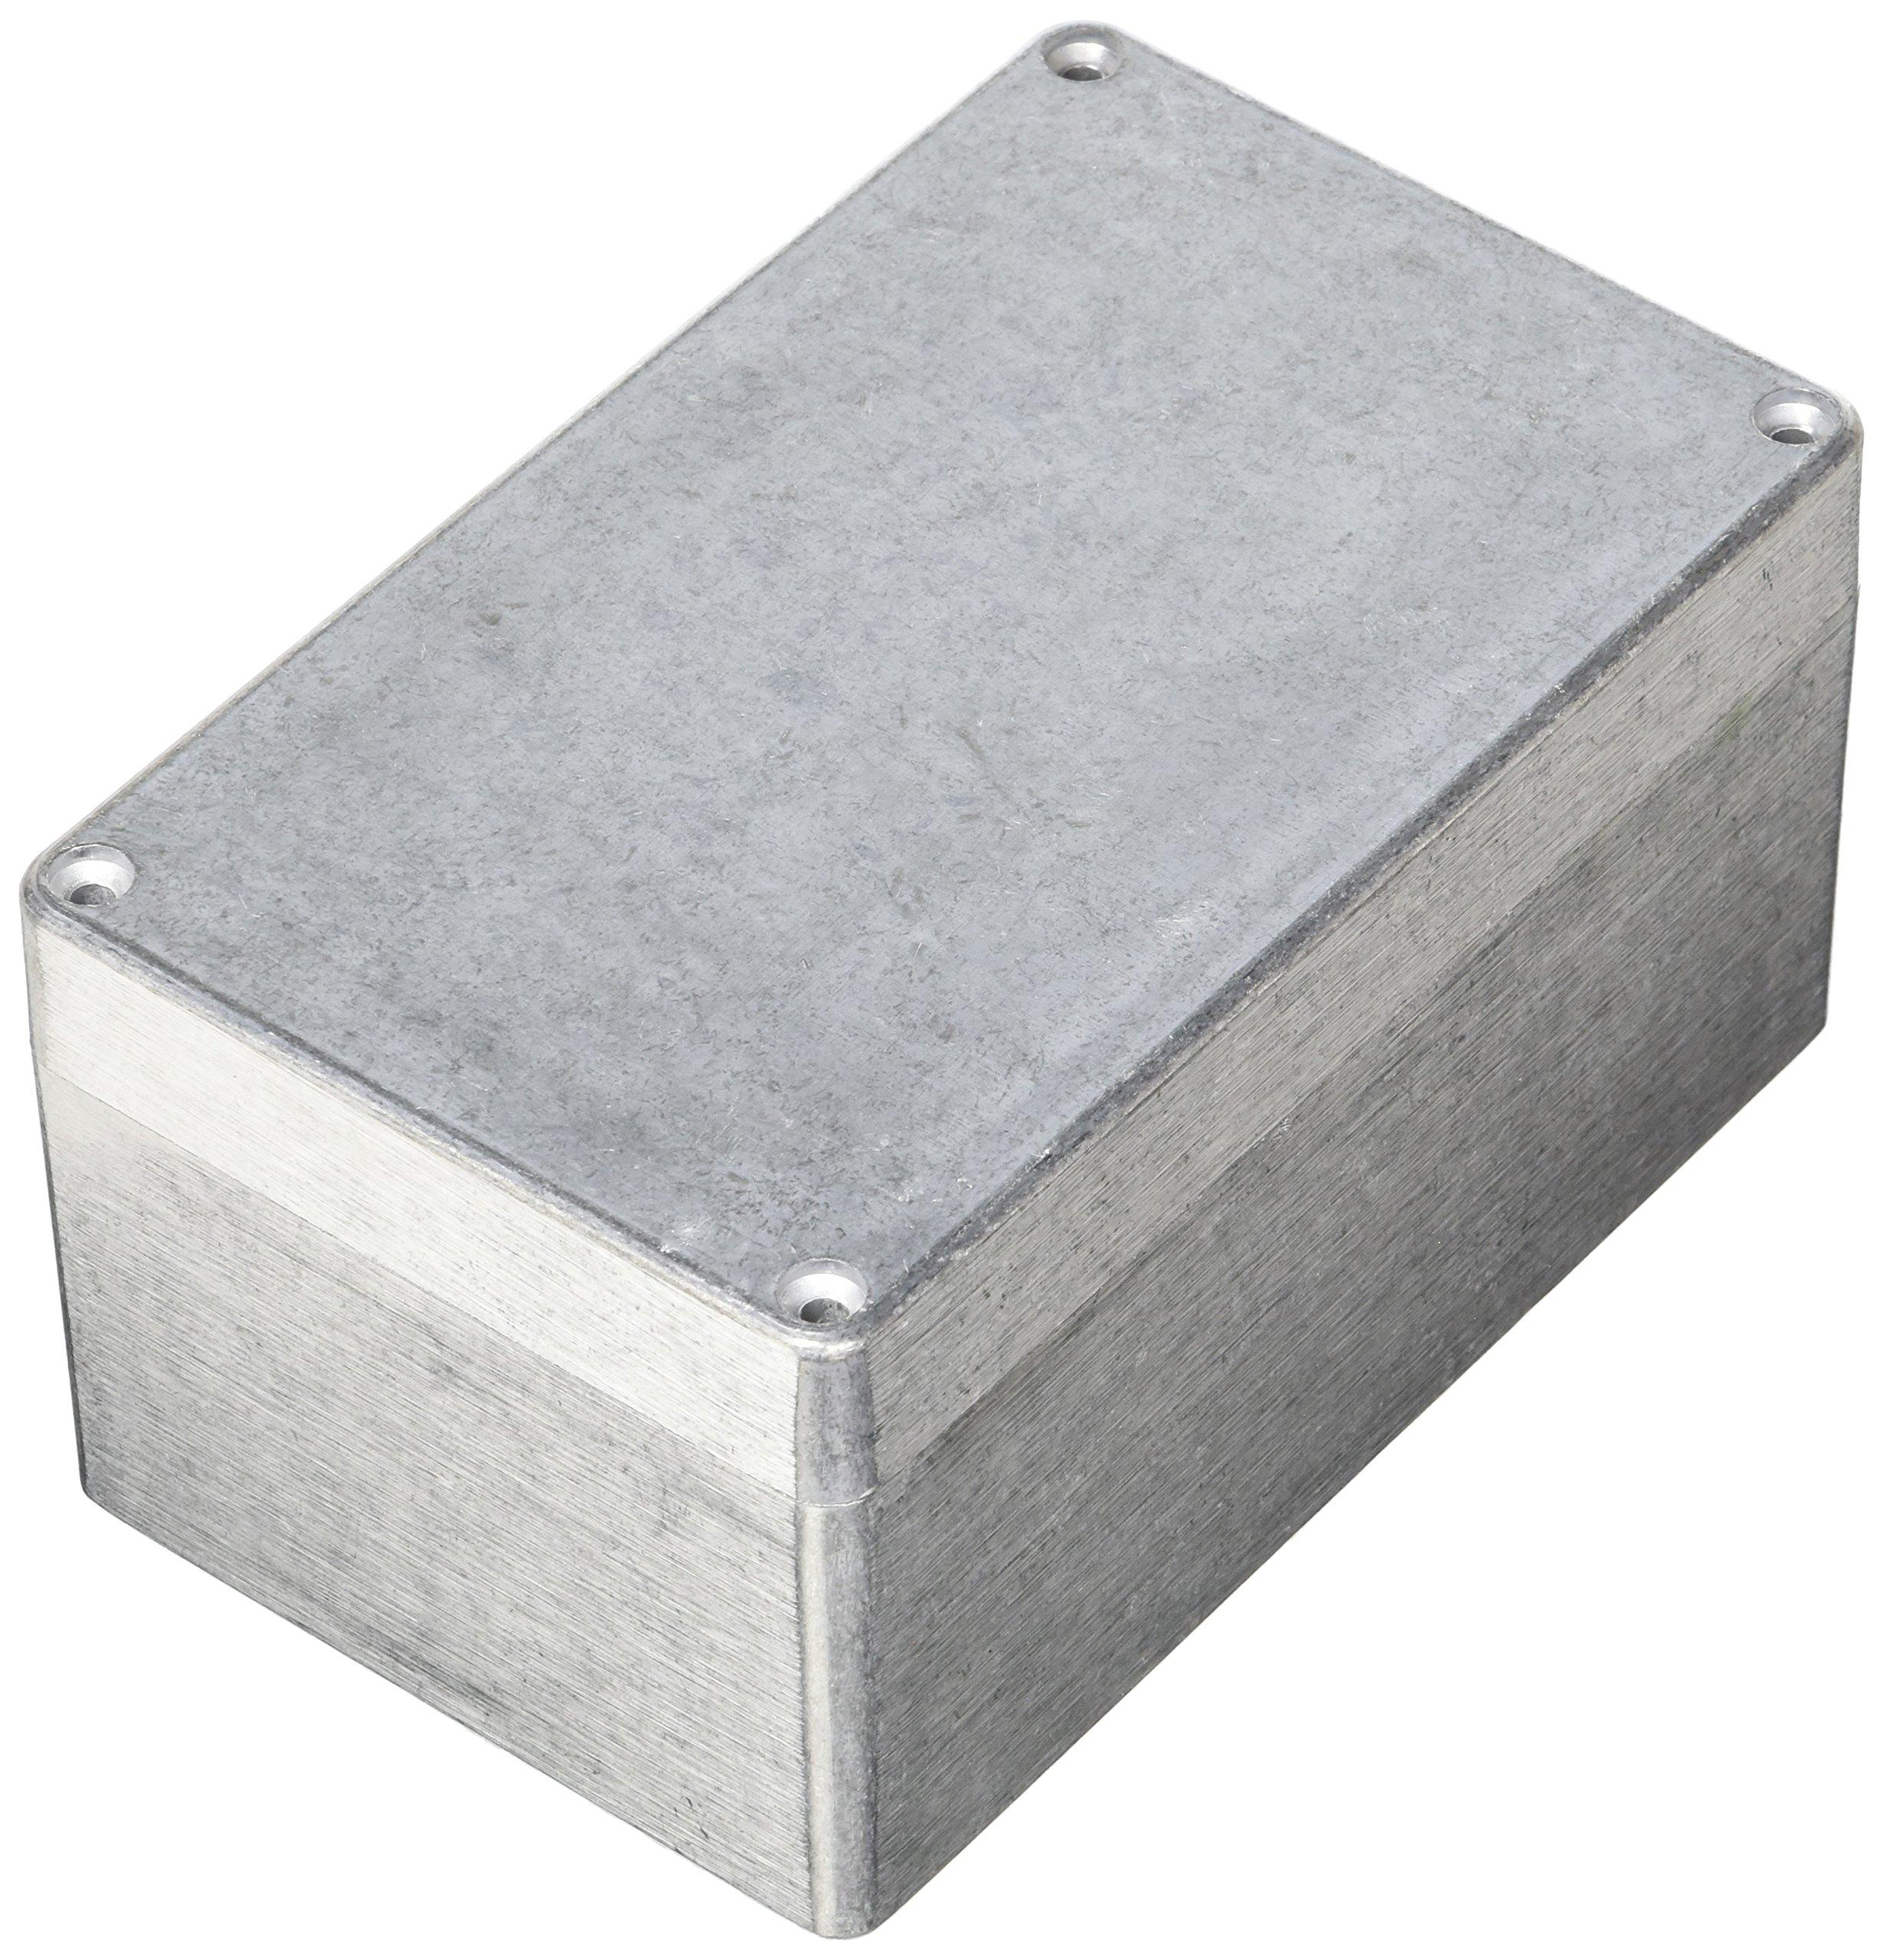 BUD Industries AN-1317-A IP68 Aluminum 6.29x3.93x3.19 Enclosure, Natural